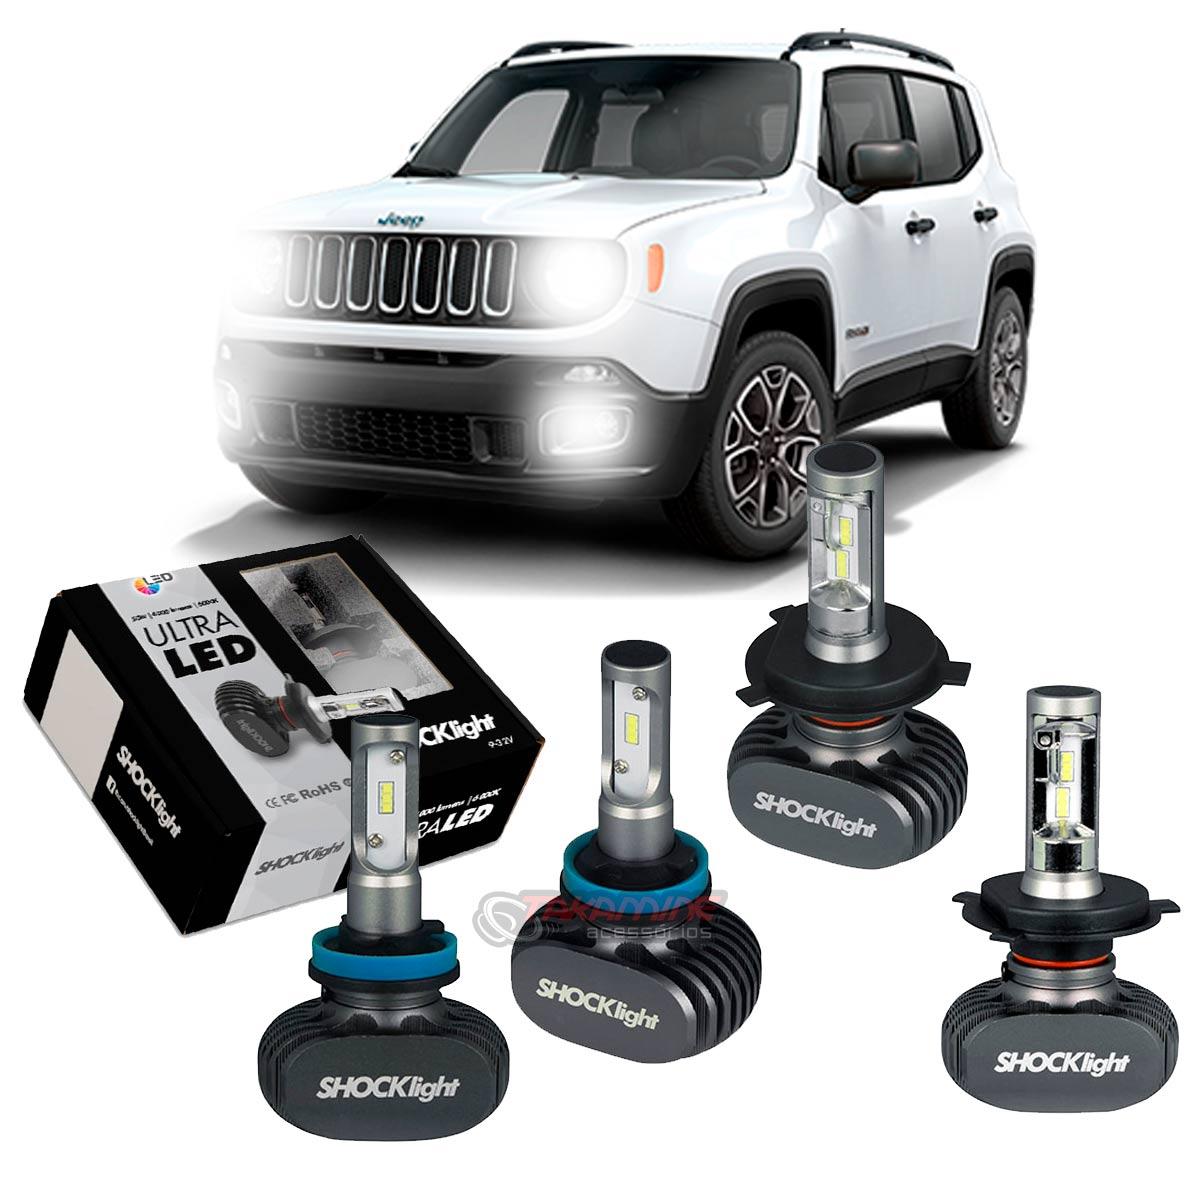 Kit Ultra LED Renegade 2015 2016 2017 2018 2019 2020 tipo xenon farol alto e baixo H4 e milha H11 50W